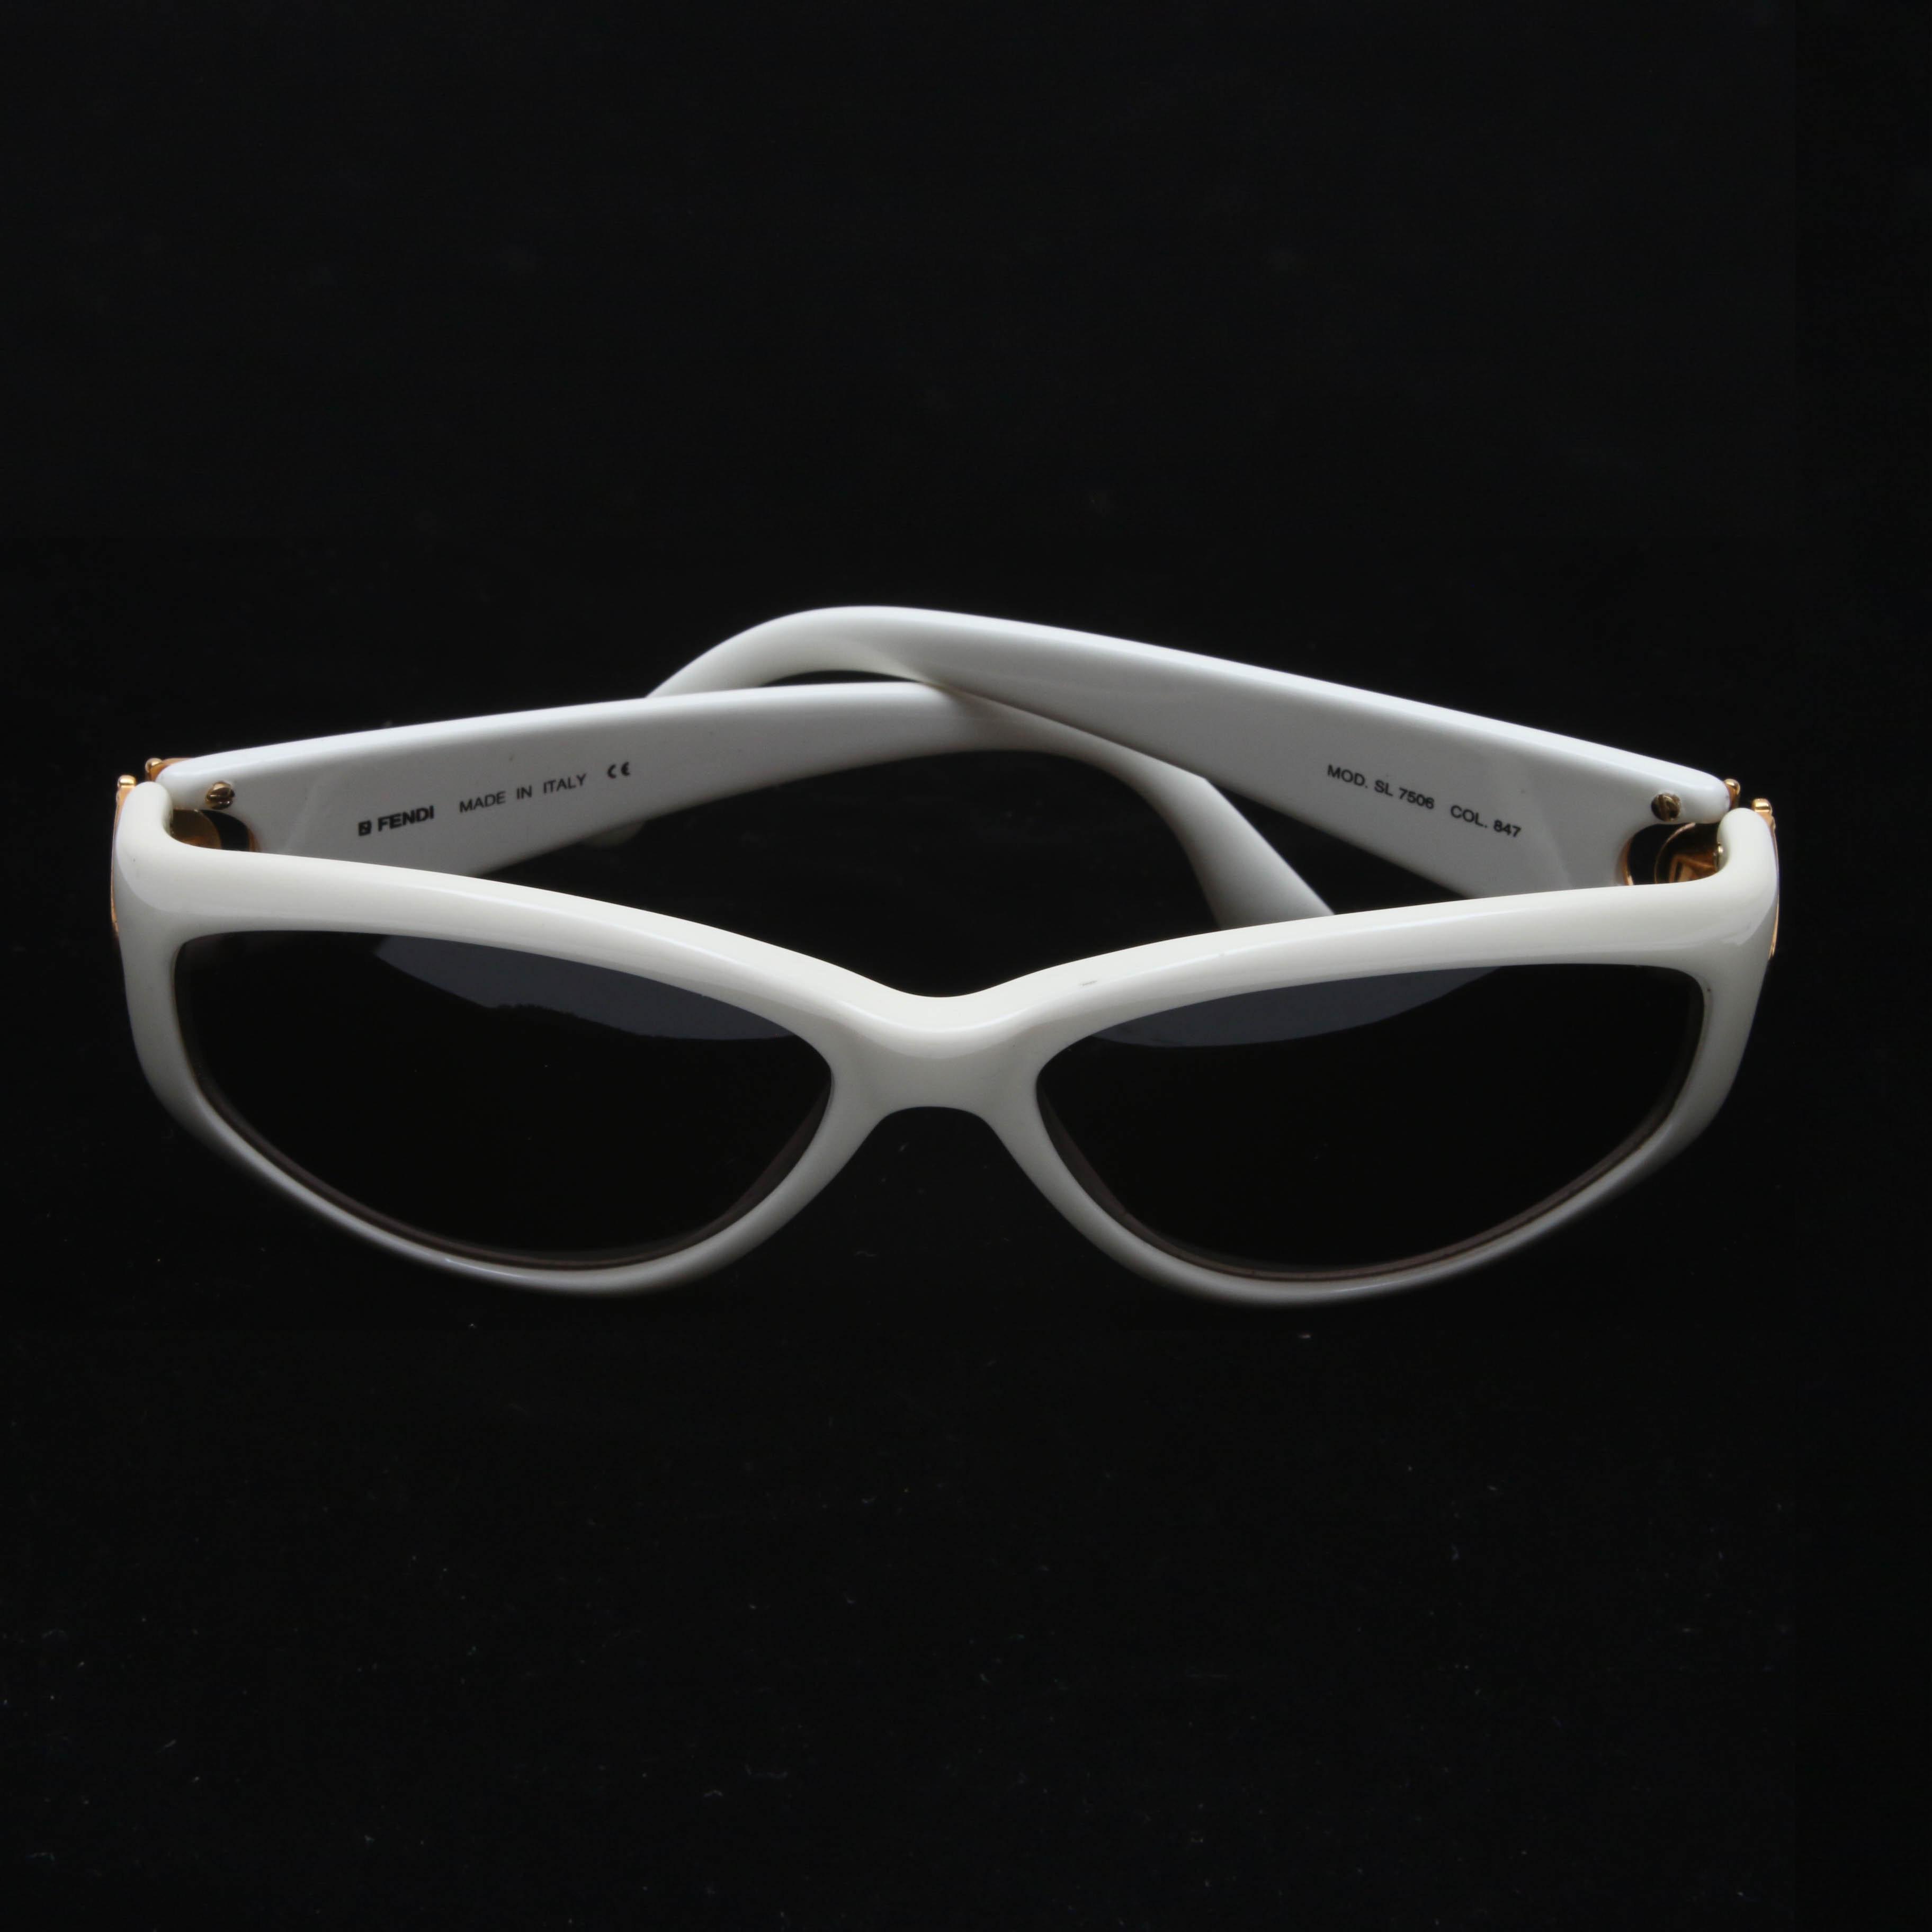 Fendi SL 7506 Modified Cat Eye Sunglasses